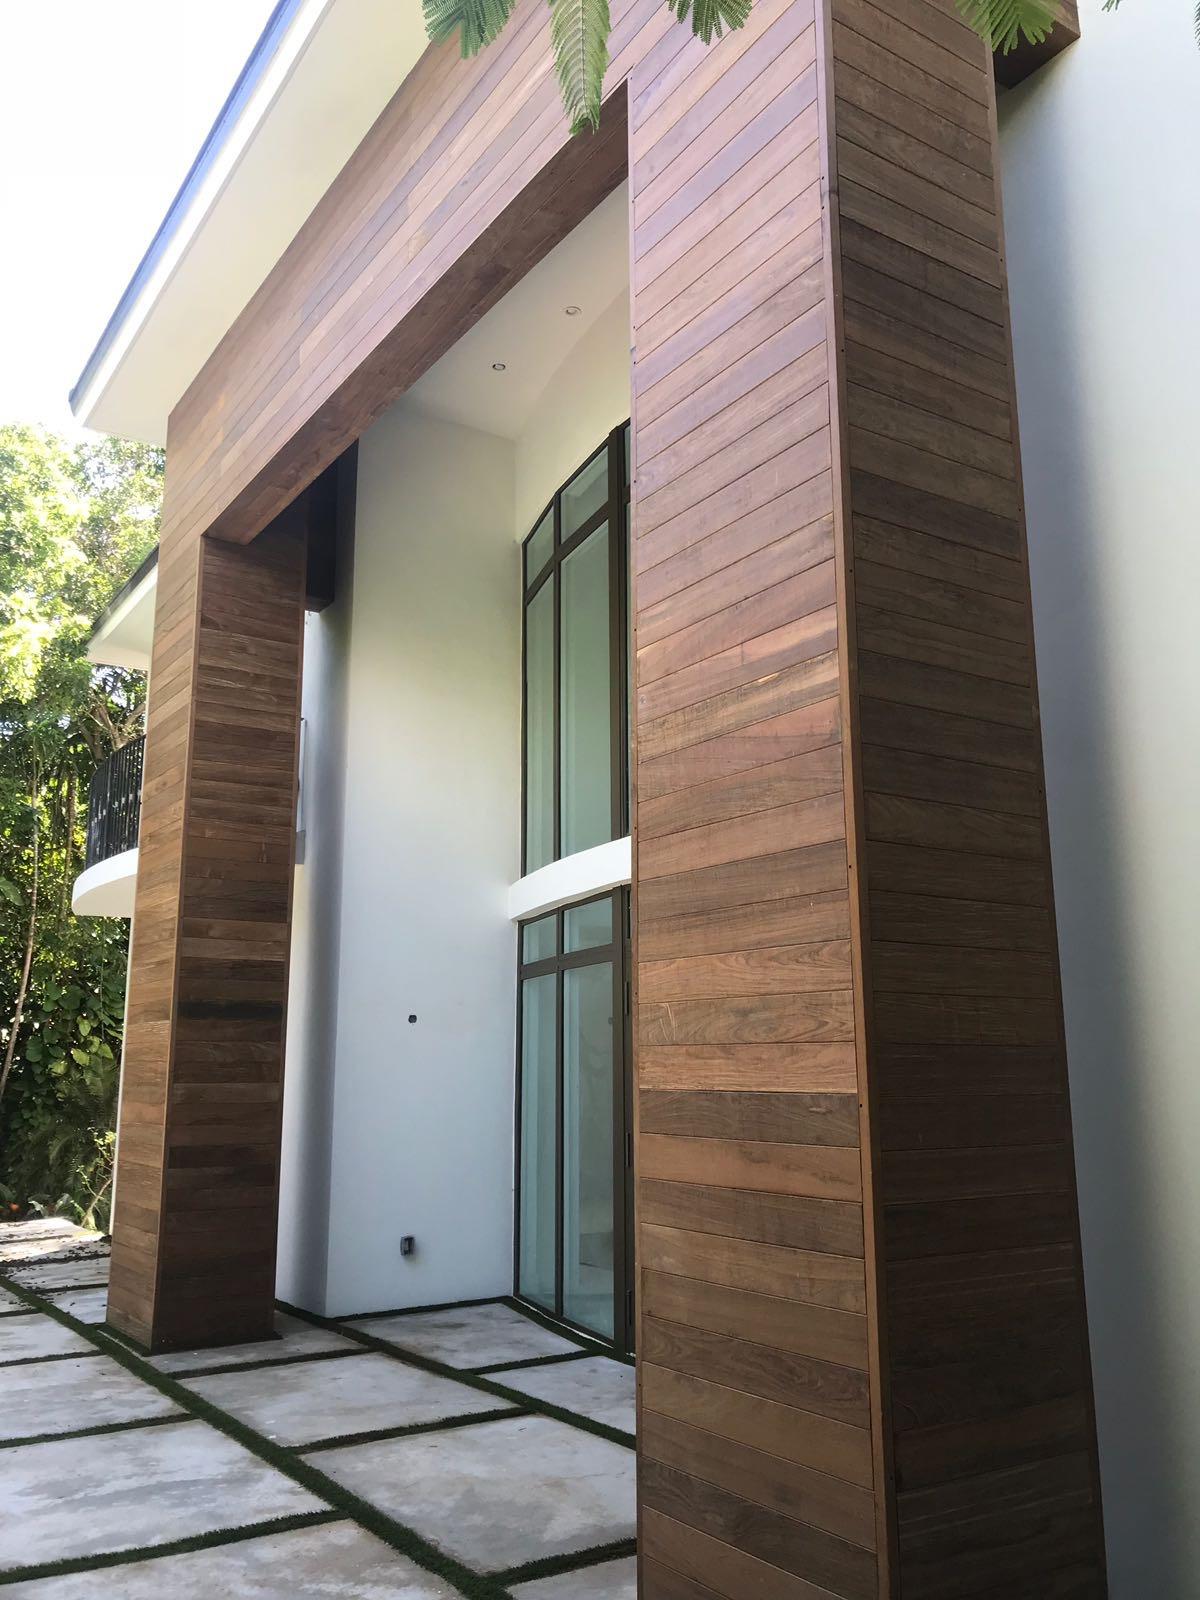 Modern Miami Siding - Ipe Decking Installation Miami on Modern Siding  id=69472